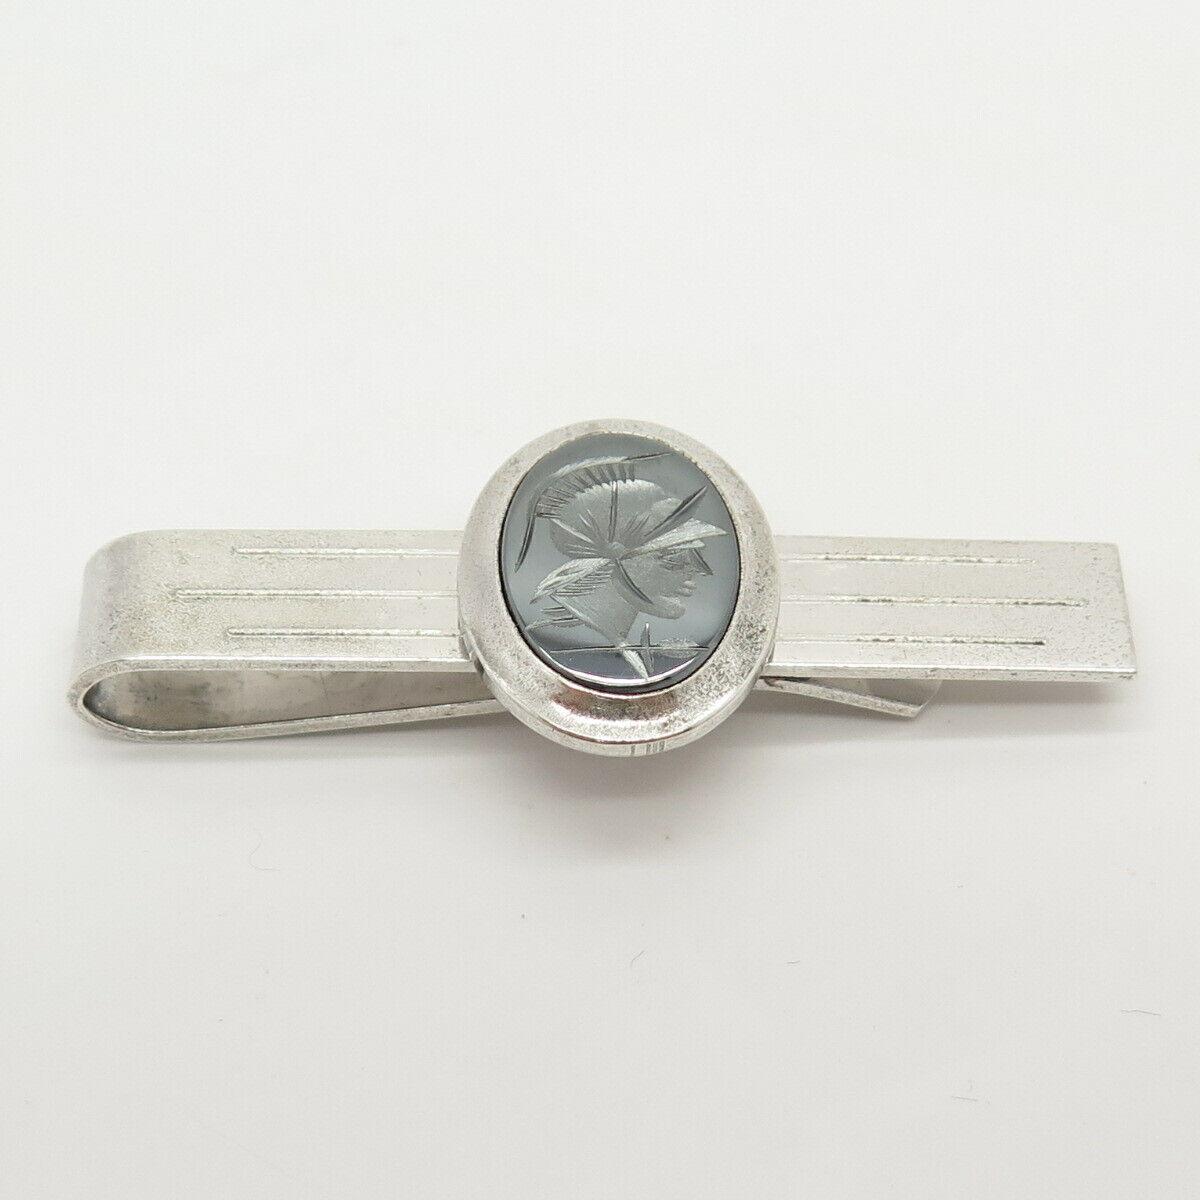 925 Sterling Silver Vintage Wells Real Hematite Gem Warrior Design Tie Clip